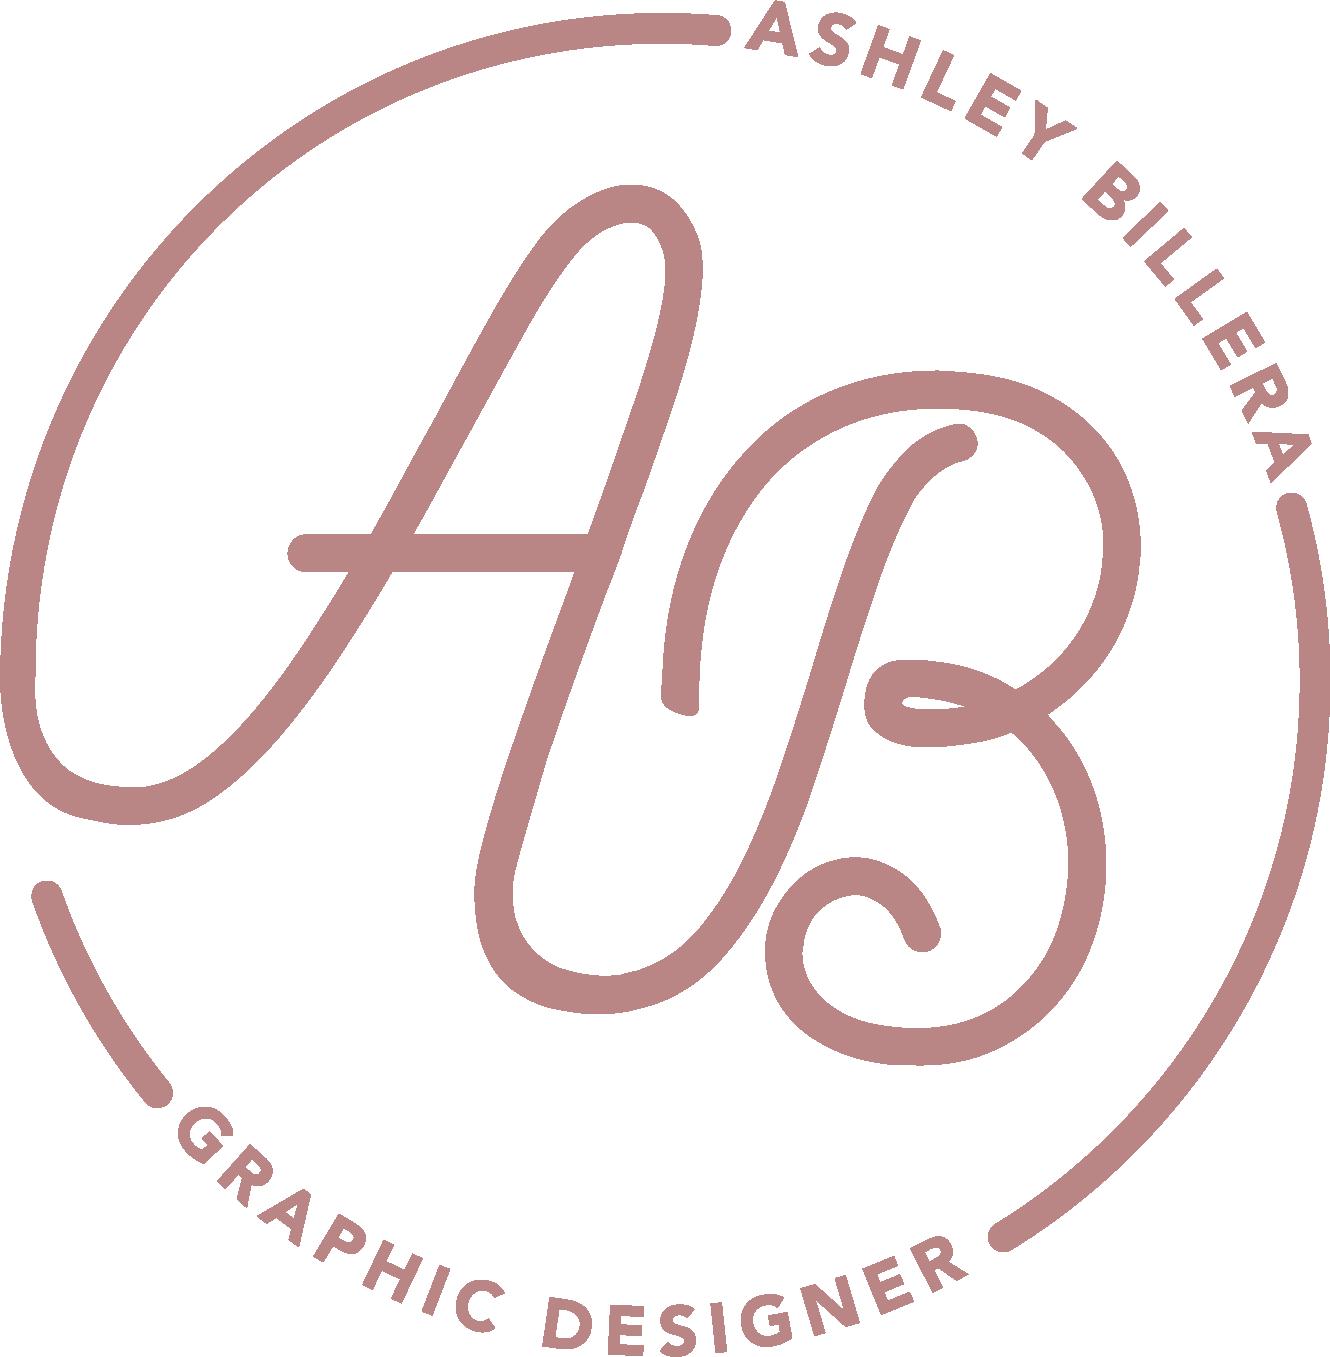 Ashley Billera